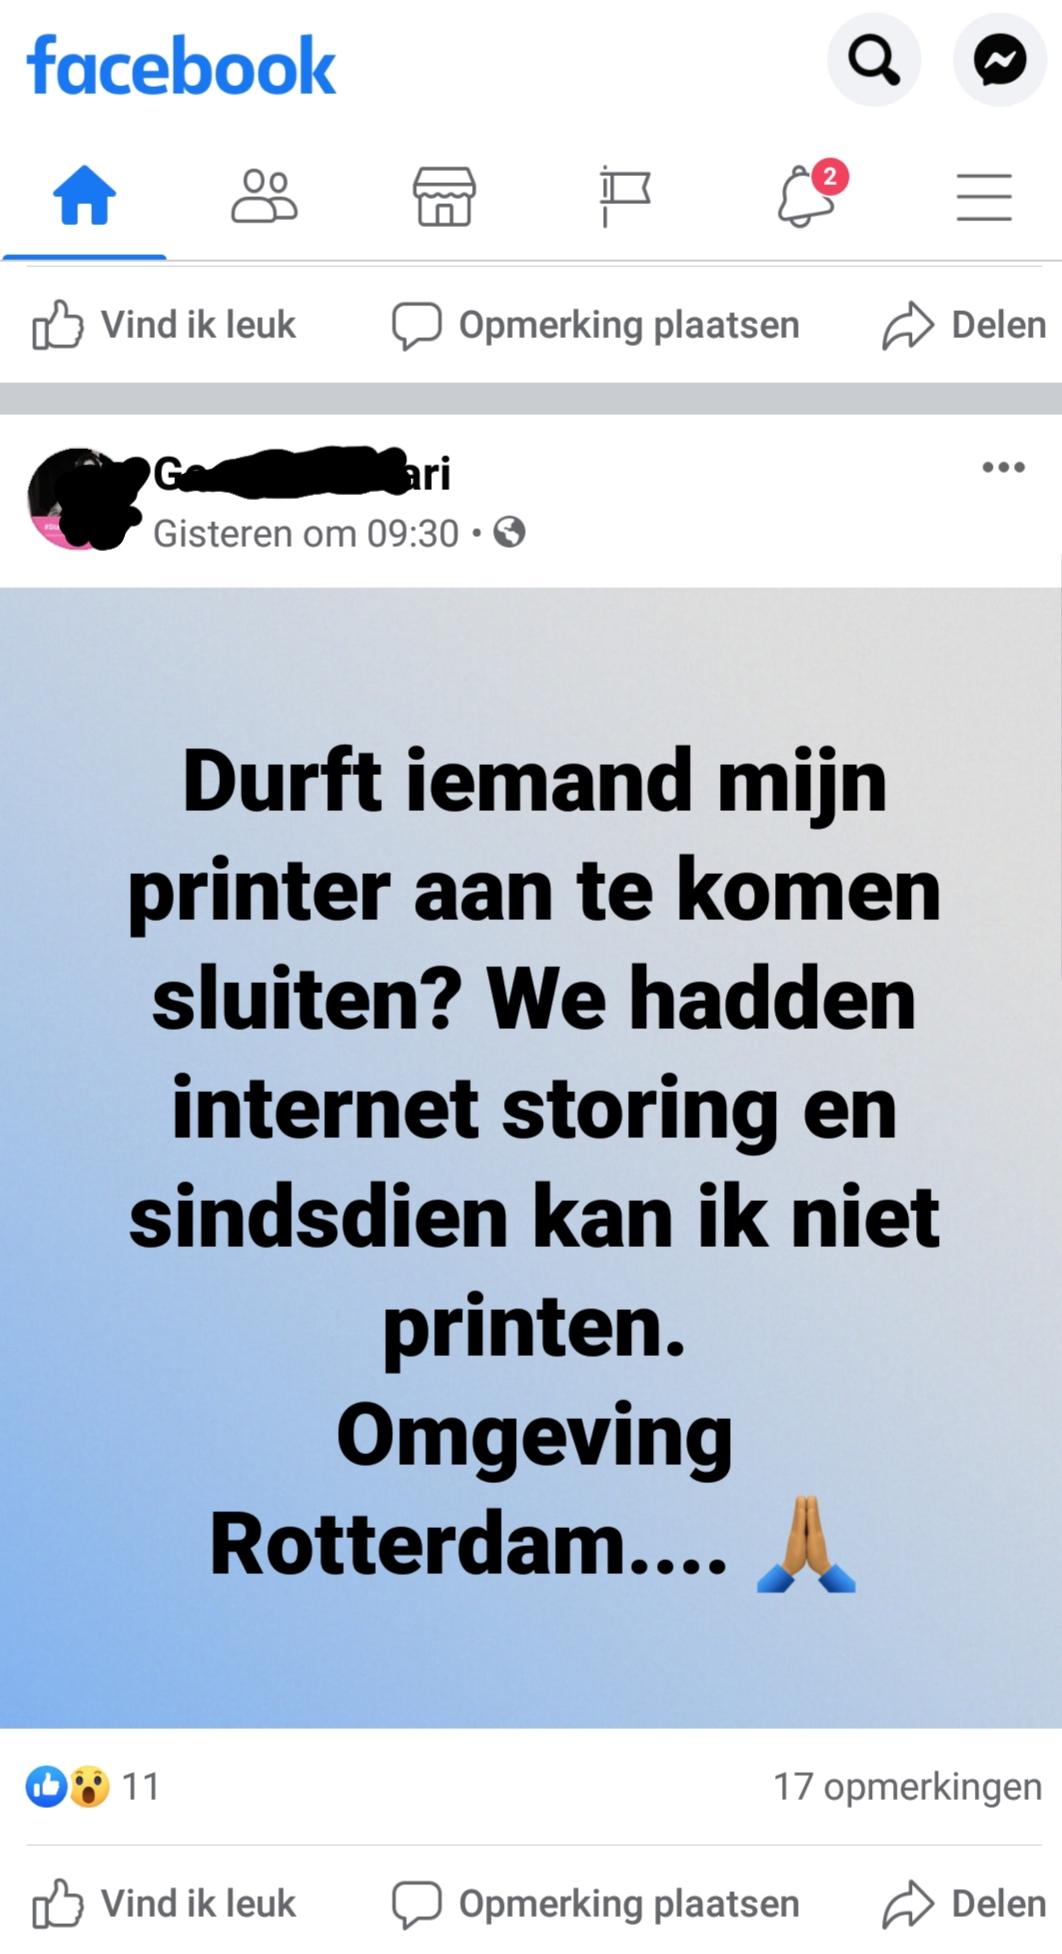 https://www.martinvrijland.nl/wp-content/uploads/2020/04/20200402_082511.jpg